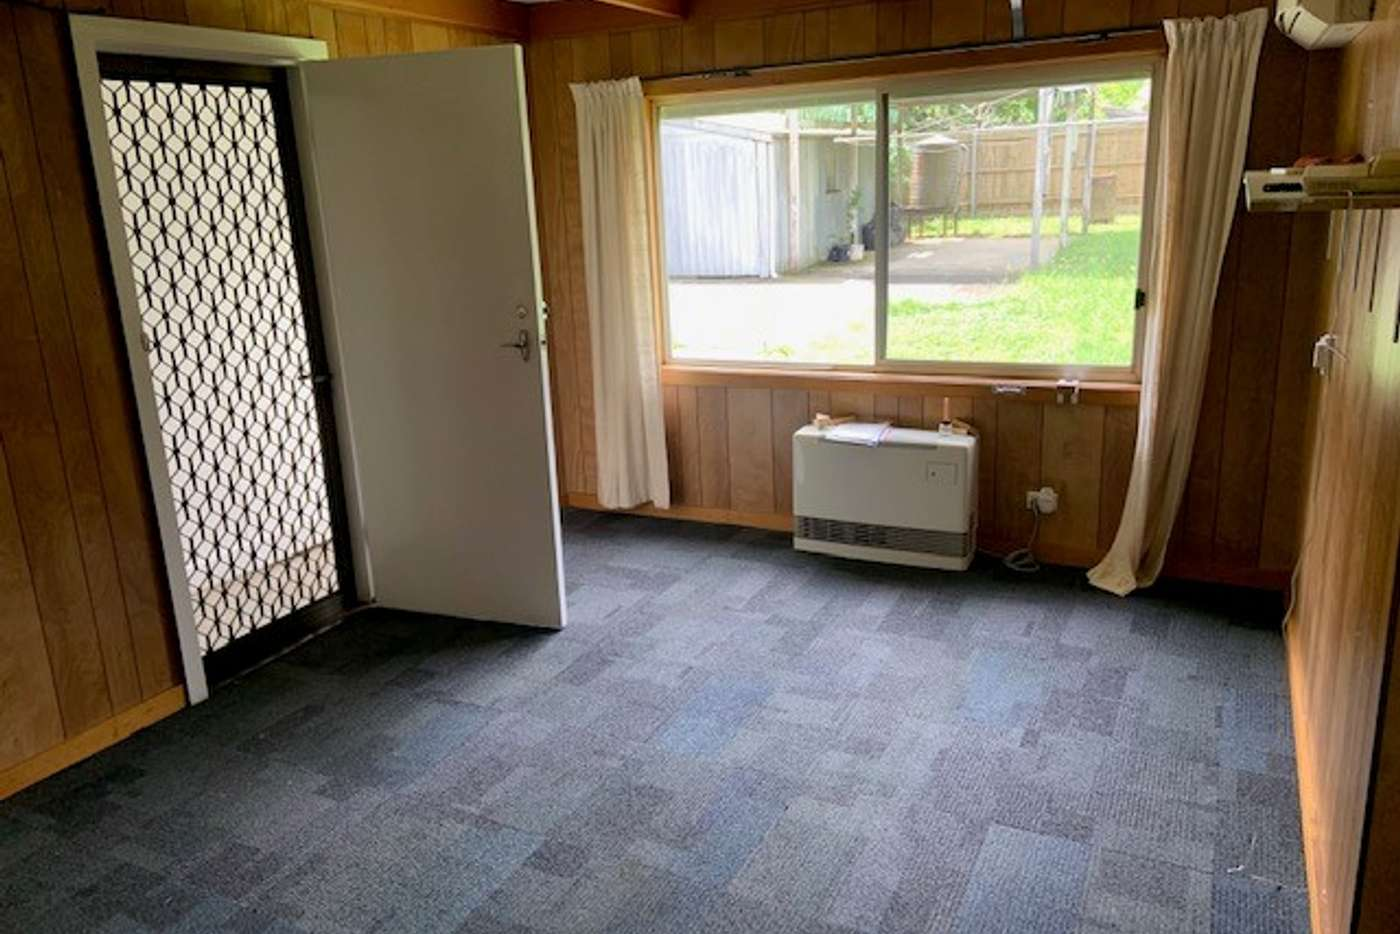 Sixth view of Homely house listing, 449 Mount Dandenong Road, Kilsyth VIC 3137